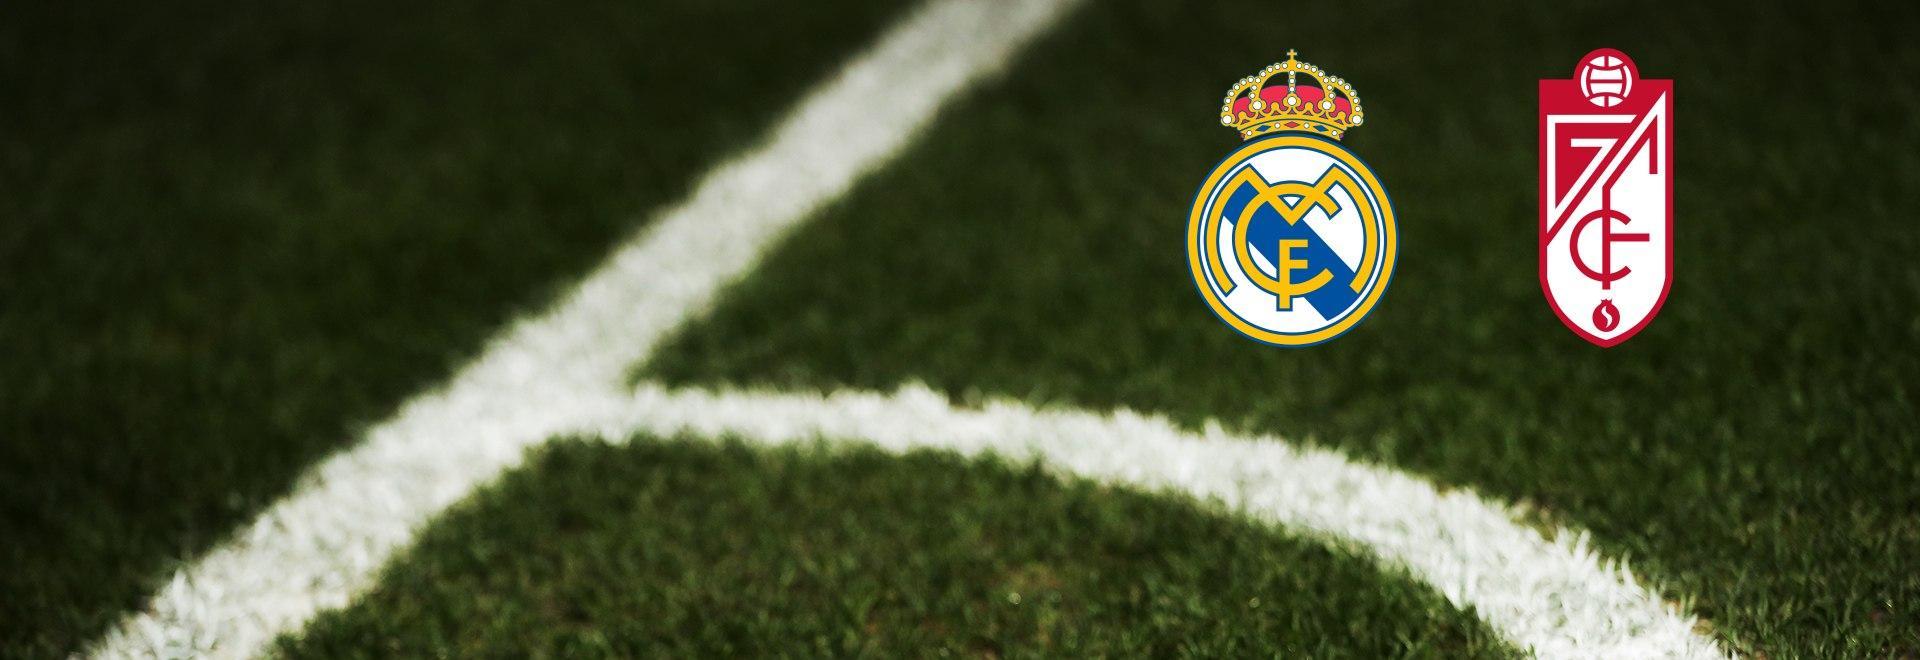 Real Madrid - Granada. 15a g.